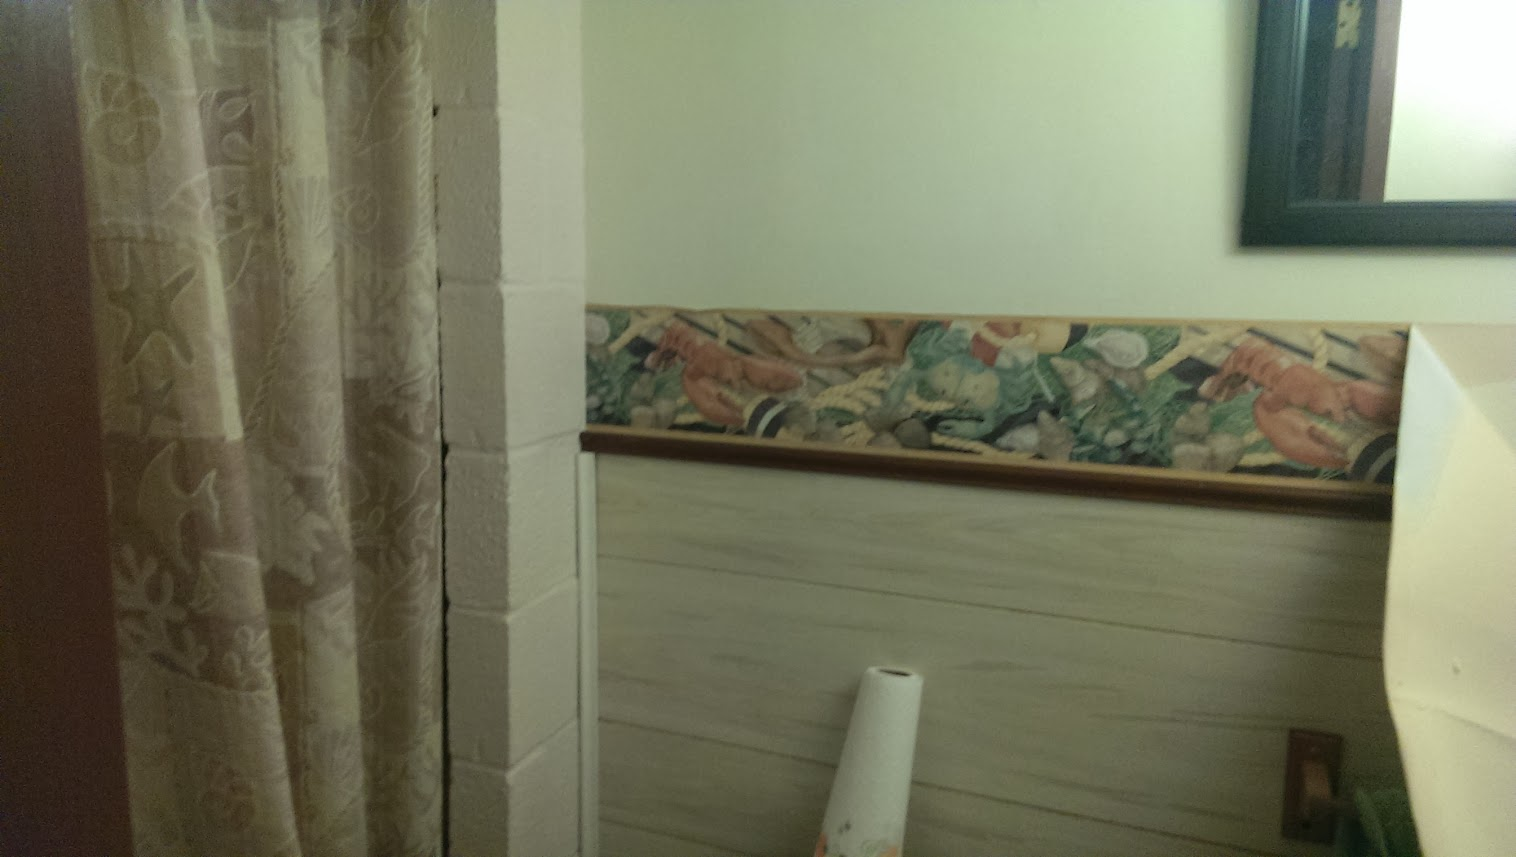 The Harry Potter Bathroom Probablyrachel